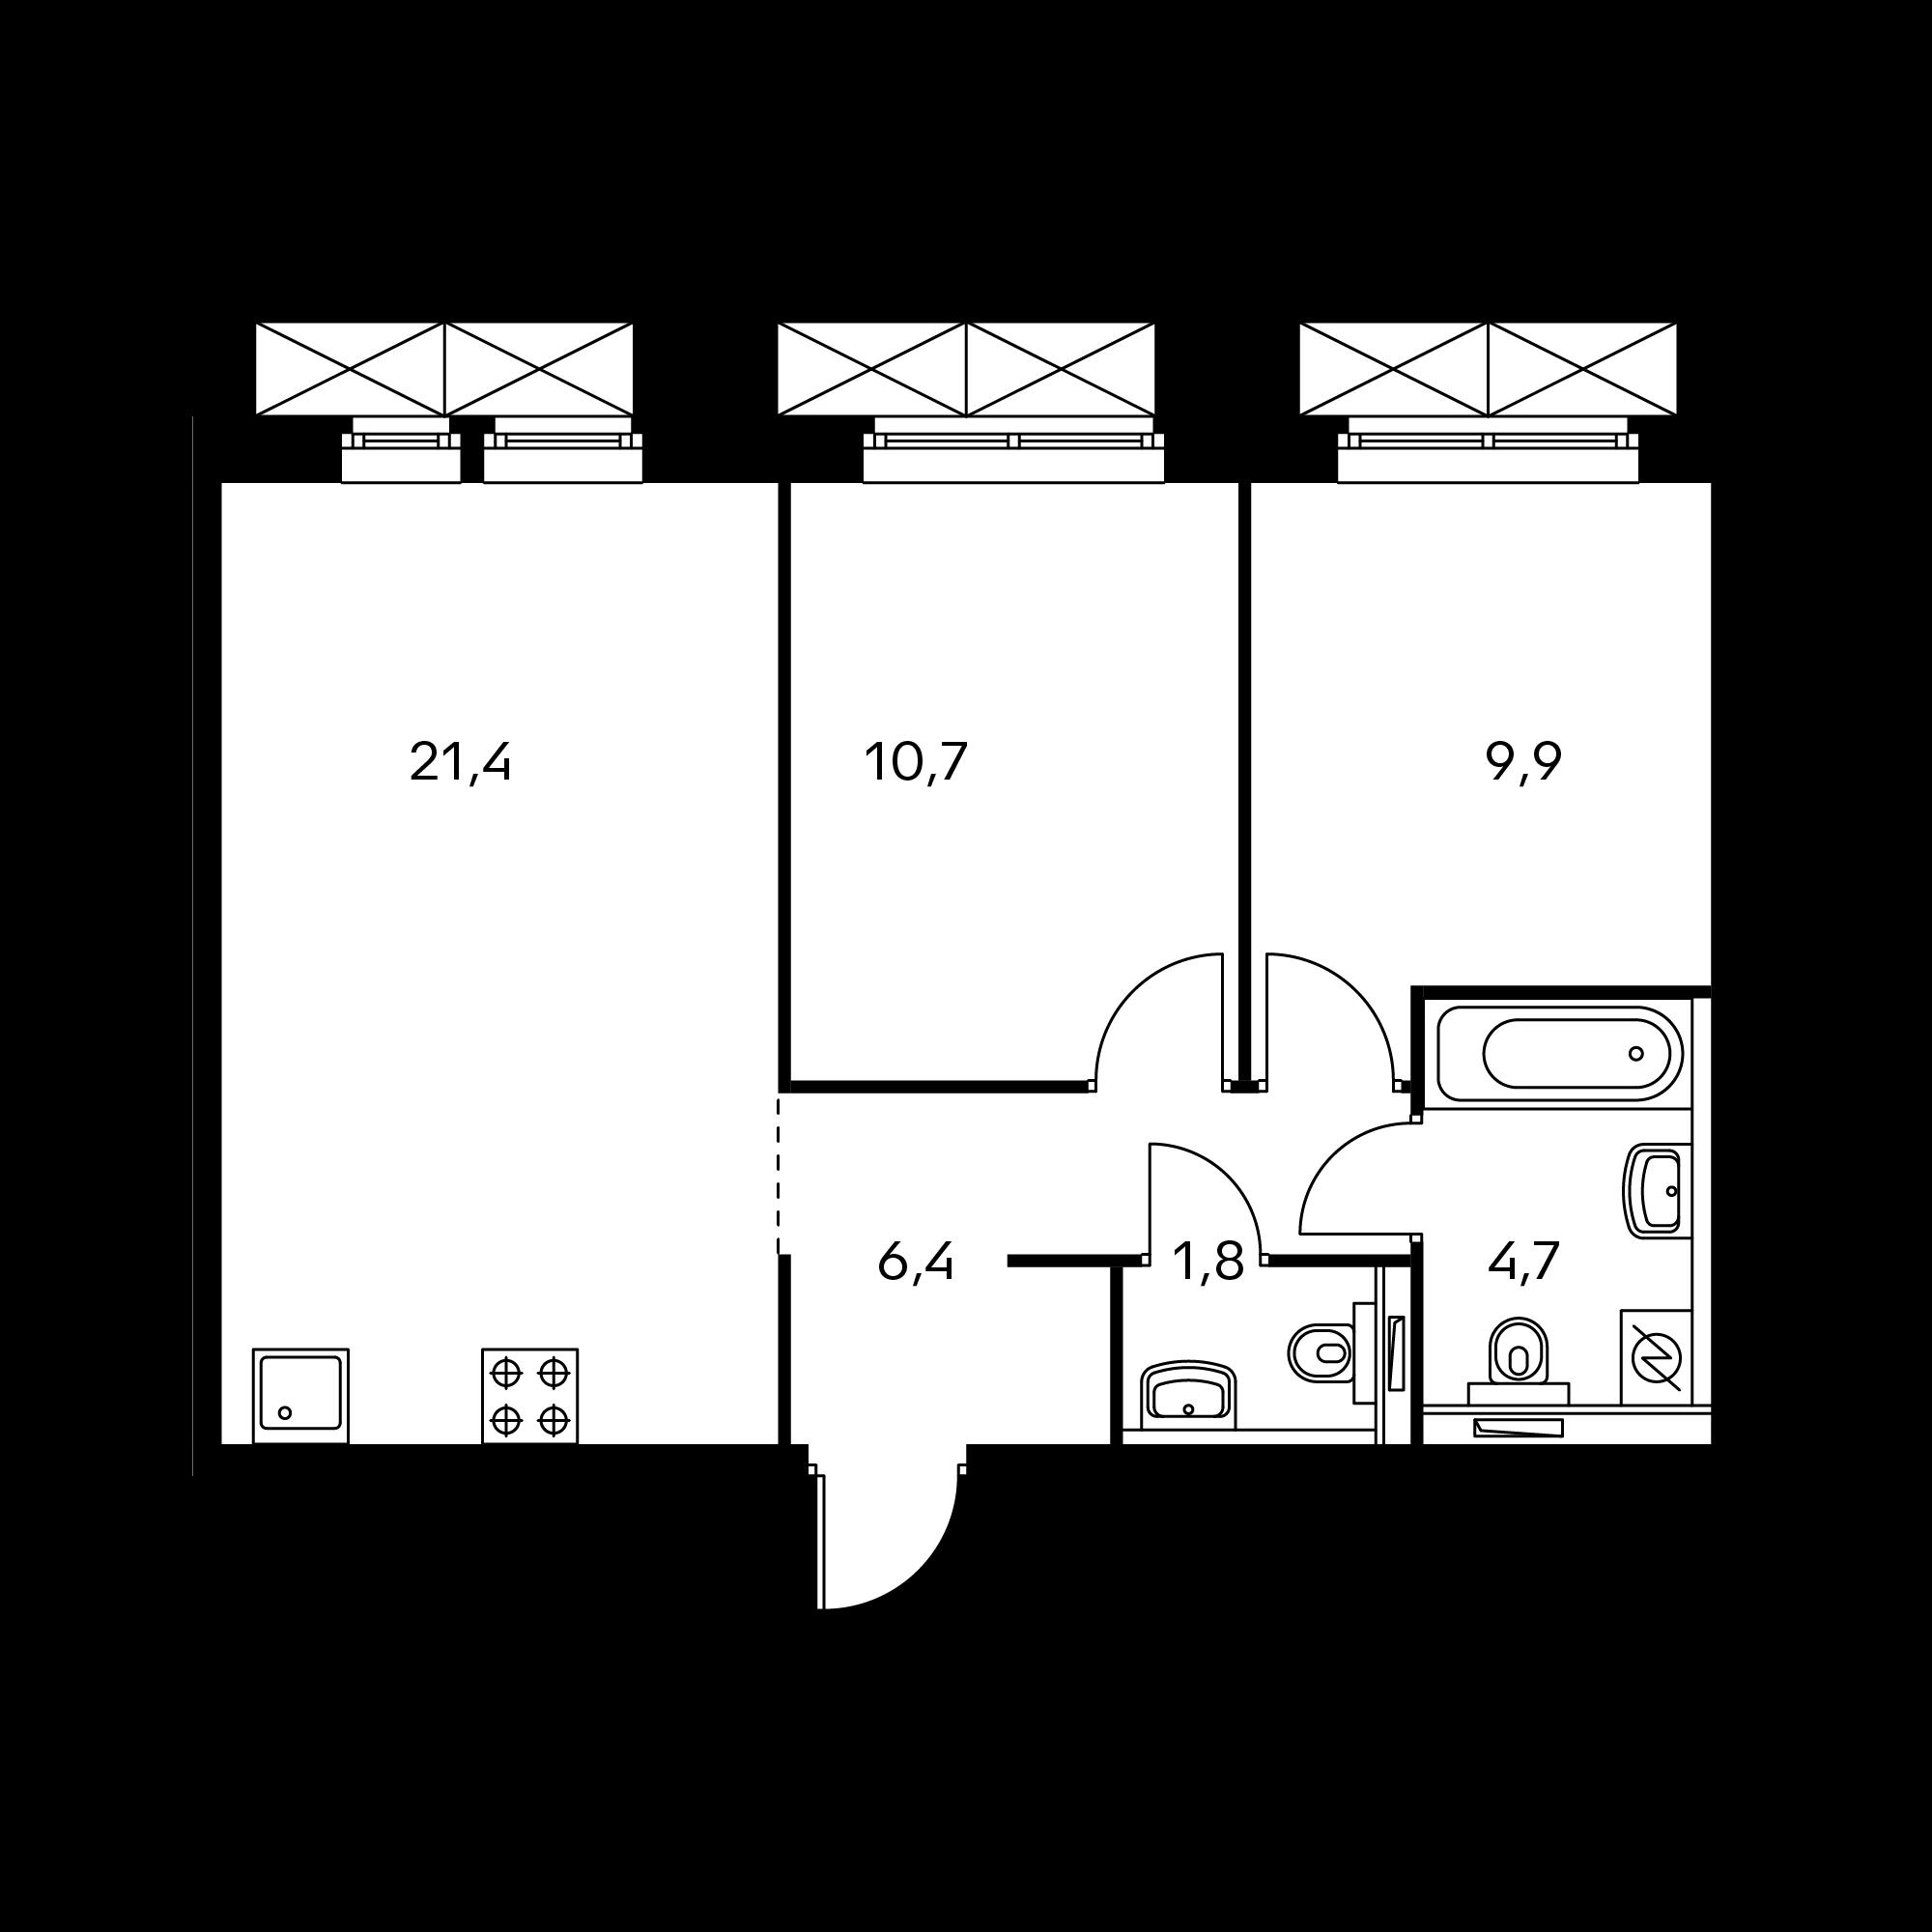 2ES9_9.6-1*